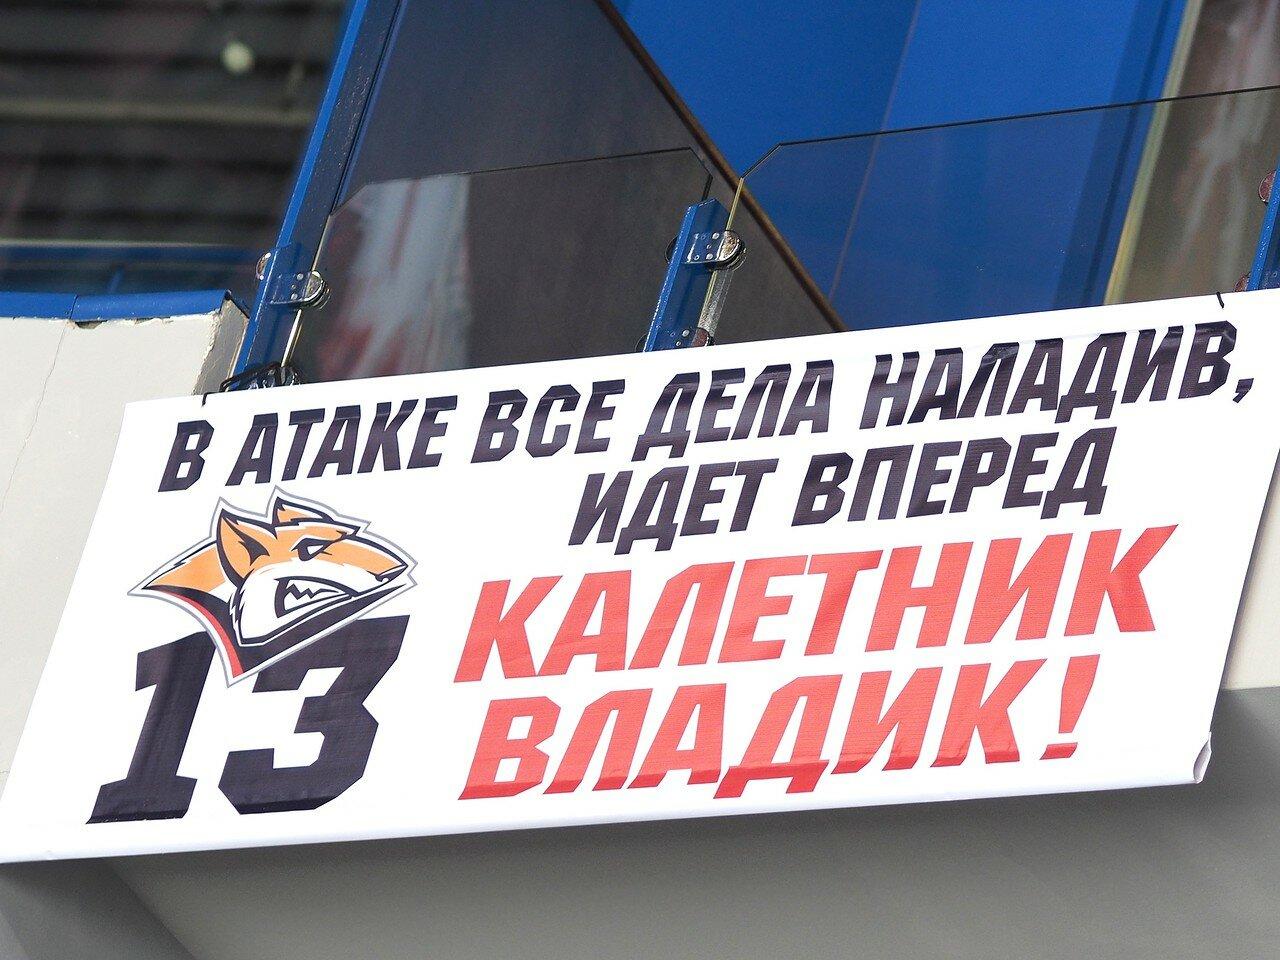 166Восток 1/2 плей-офф Металлург - Сибирь 08.03.2016